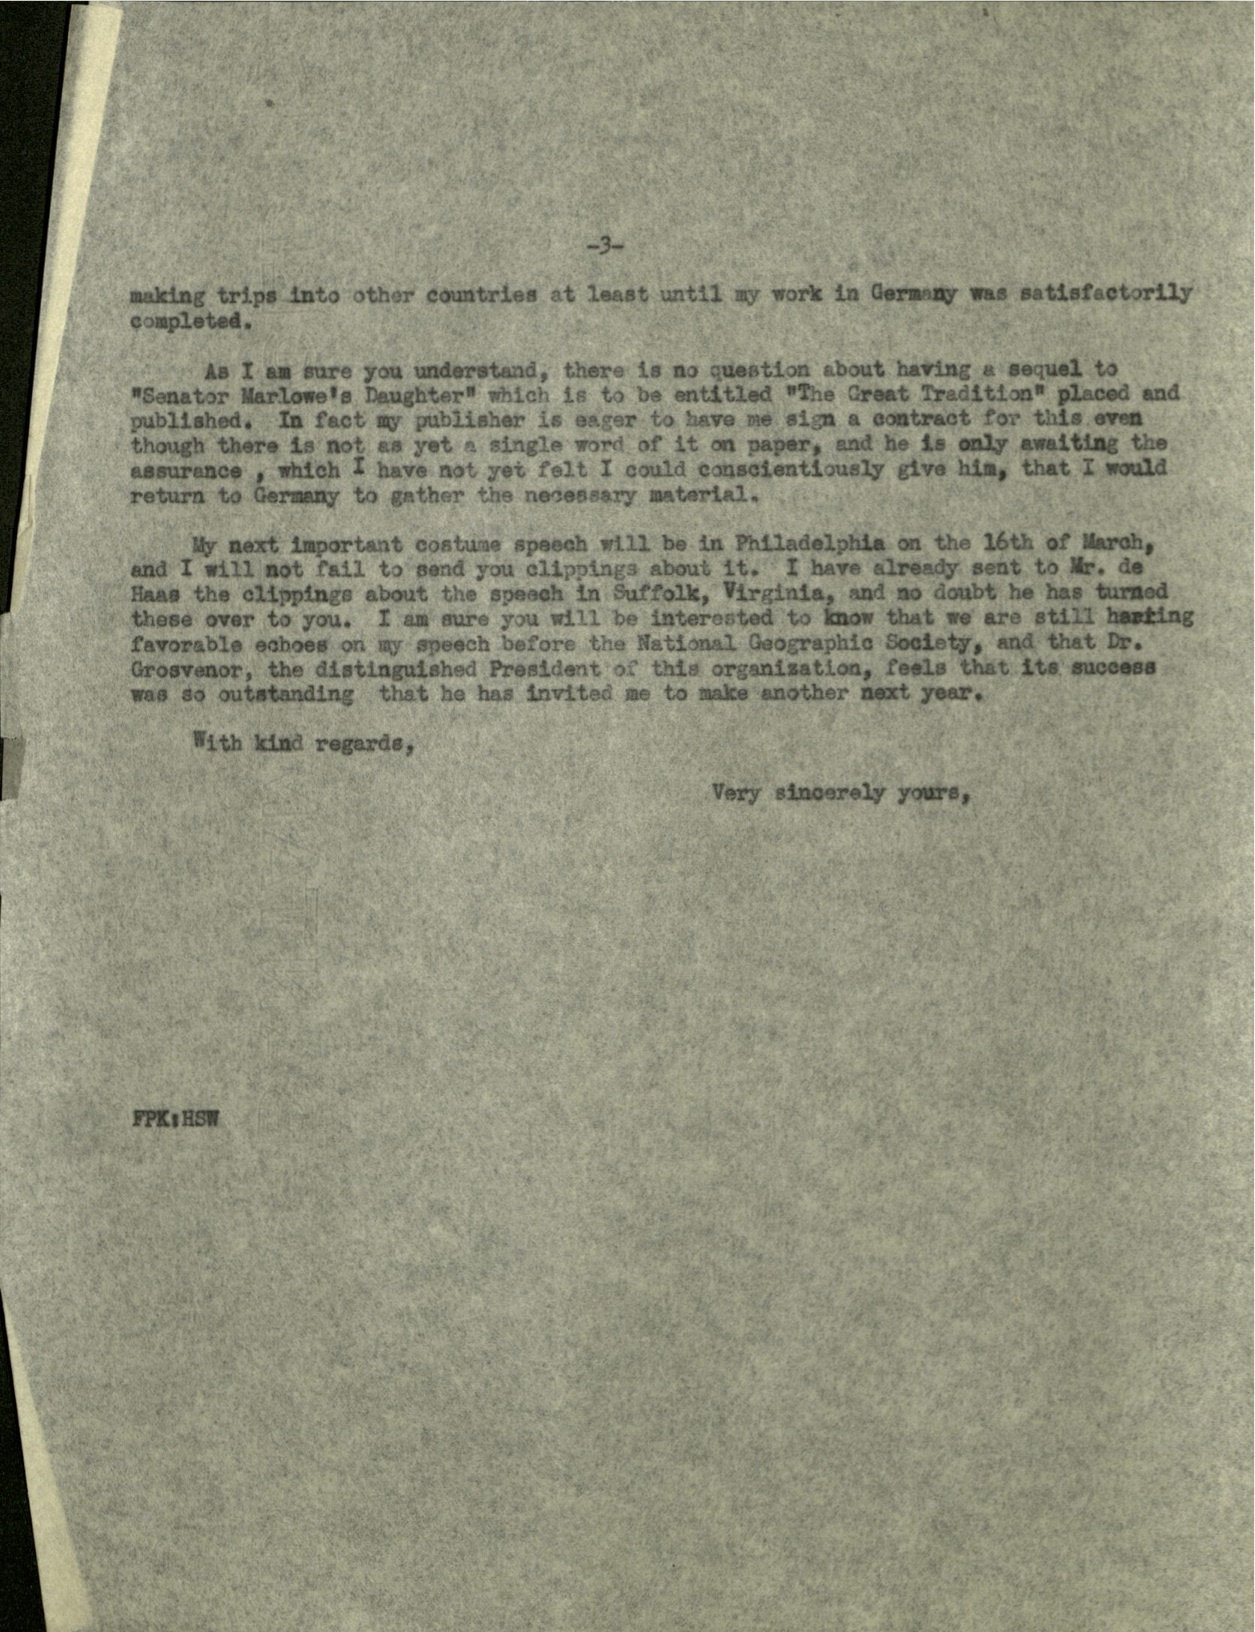 KIC Document 0001-7-7.jpg